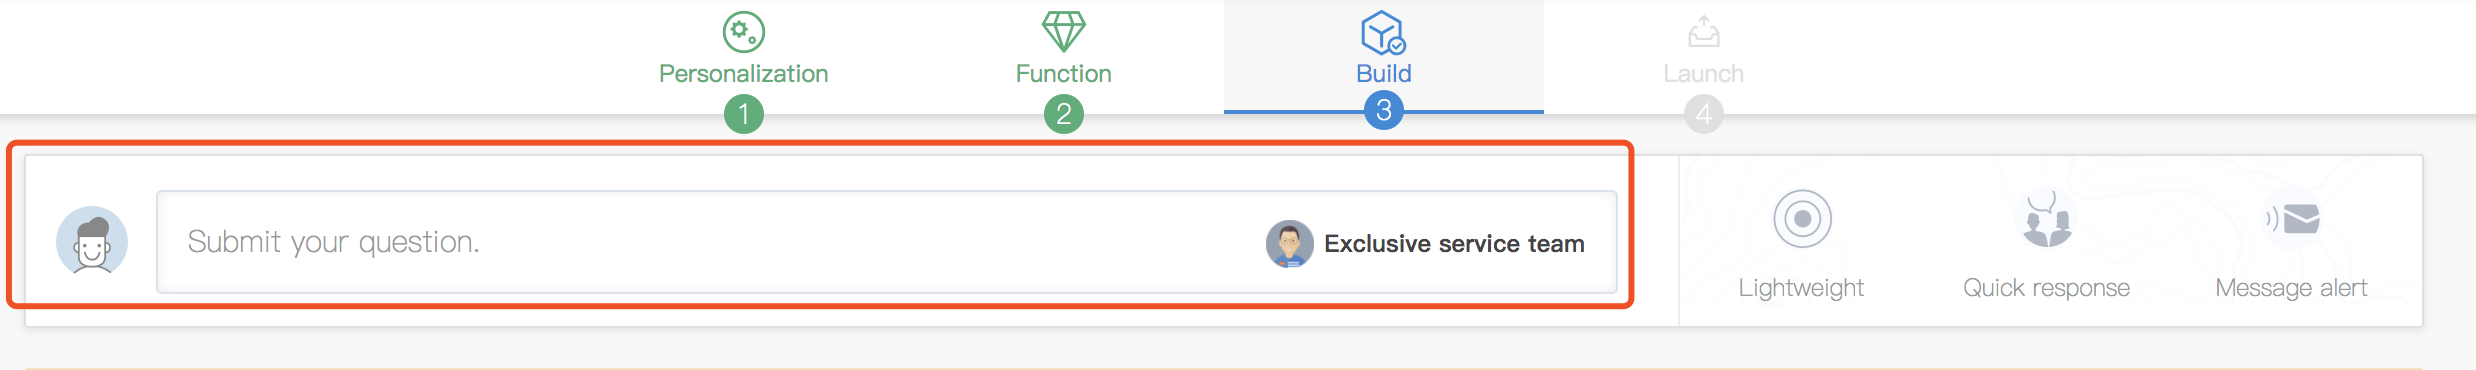 OEM App Auto Building